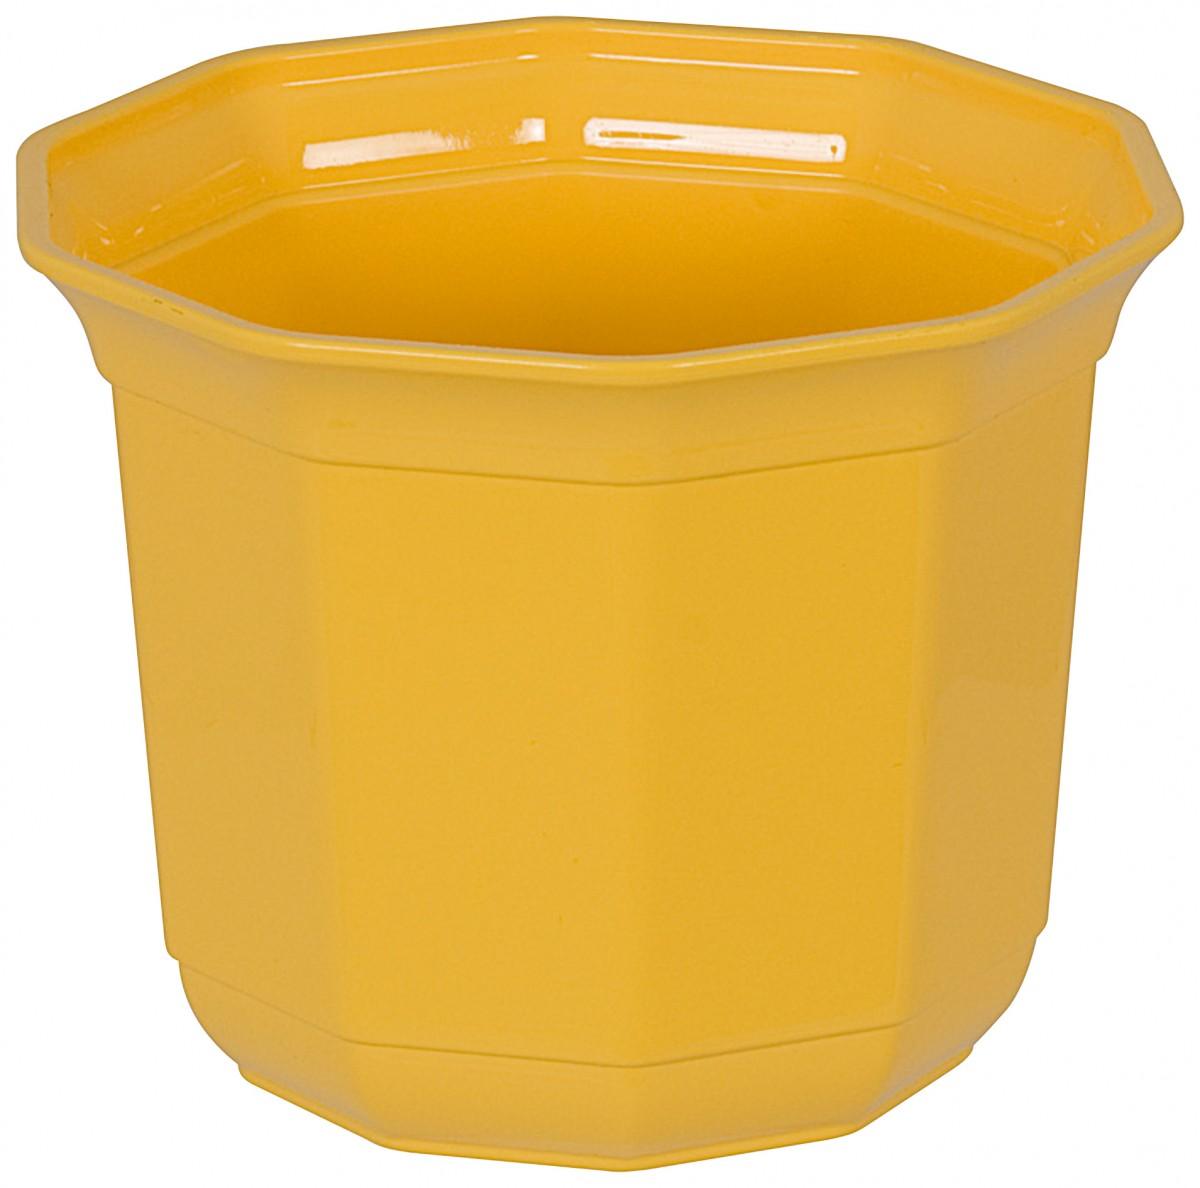 bertopf classic in gelb aus kunststoff gartencenter bert pfe. Black Bedroom Furniture Sets. Home Design Ideas